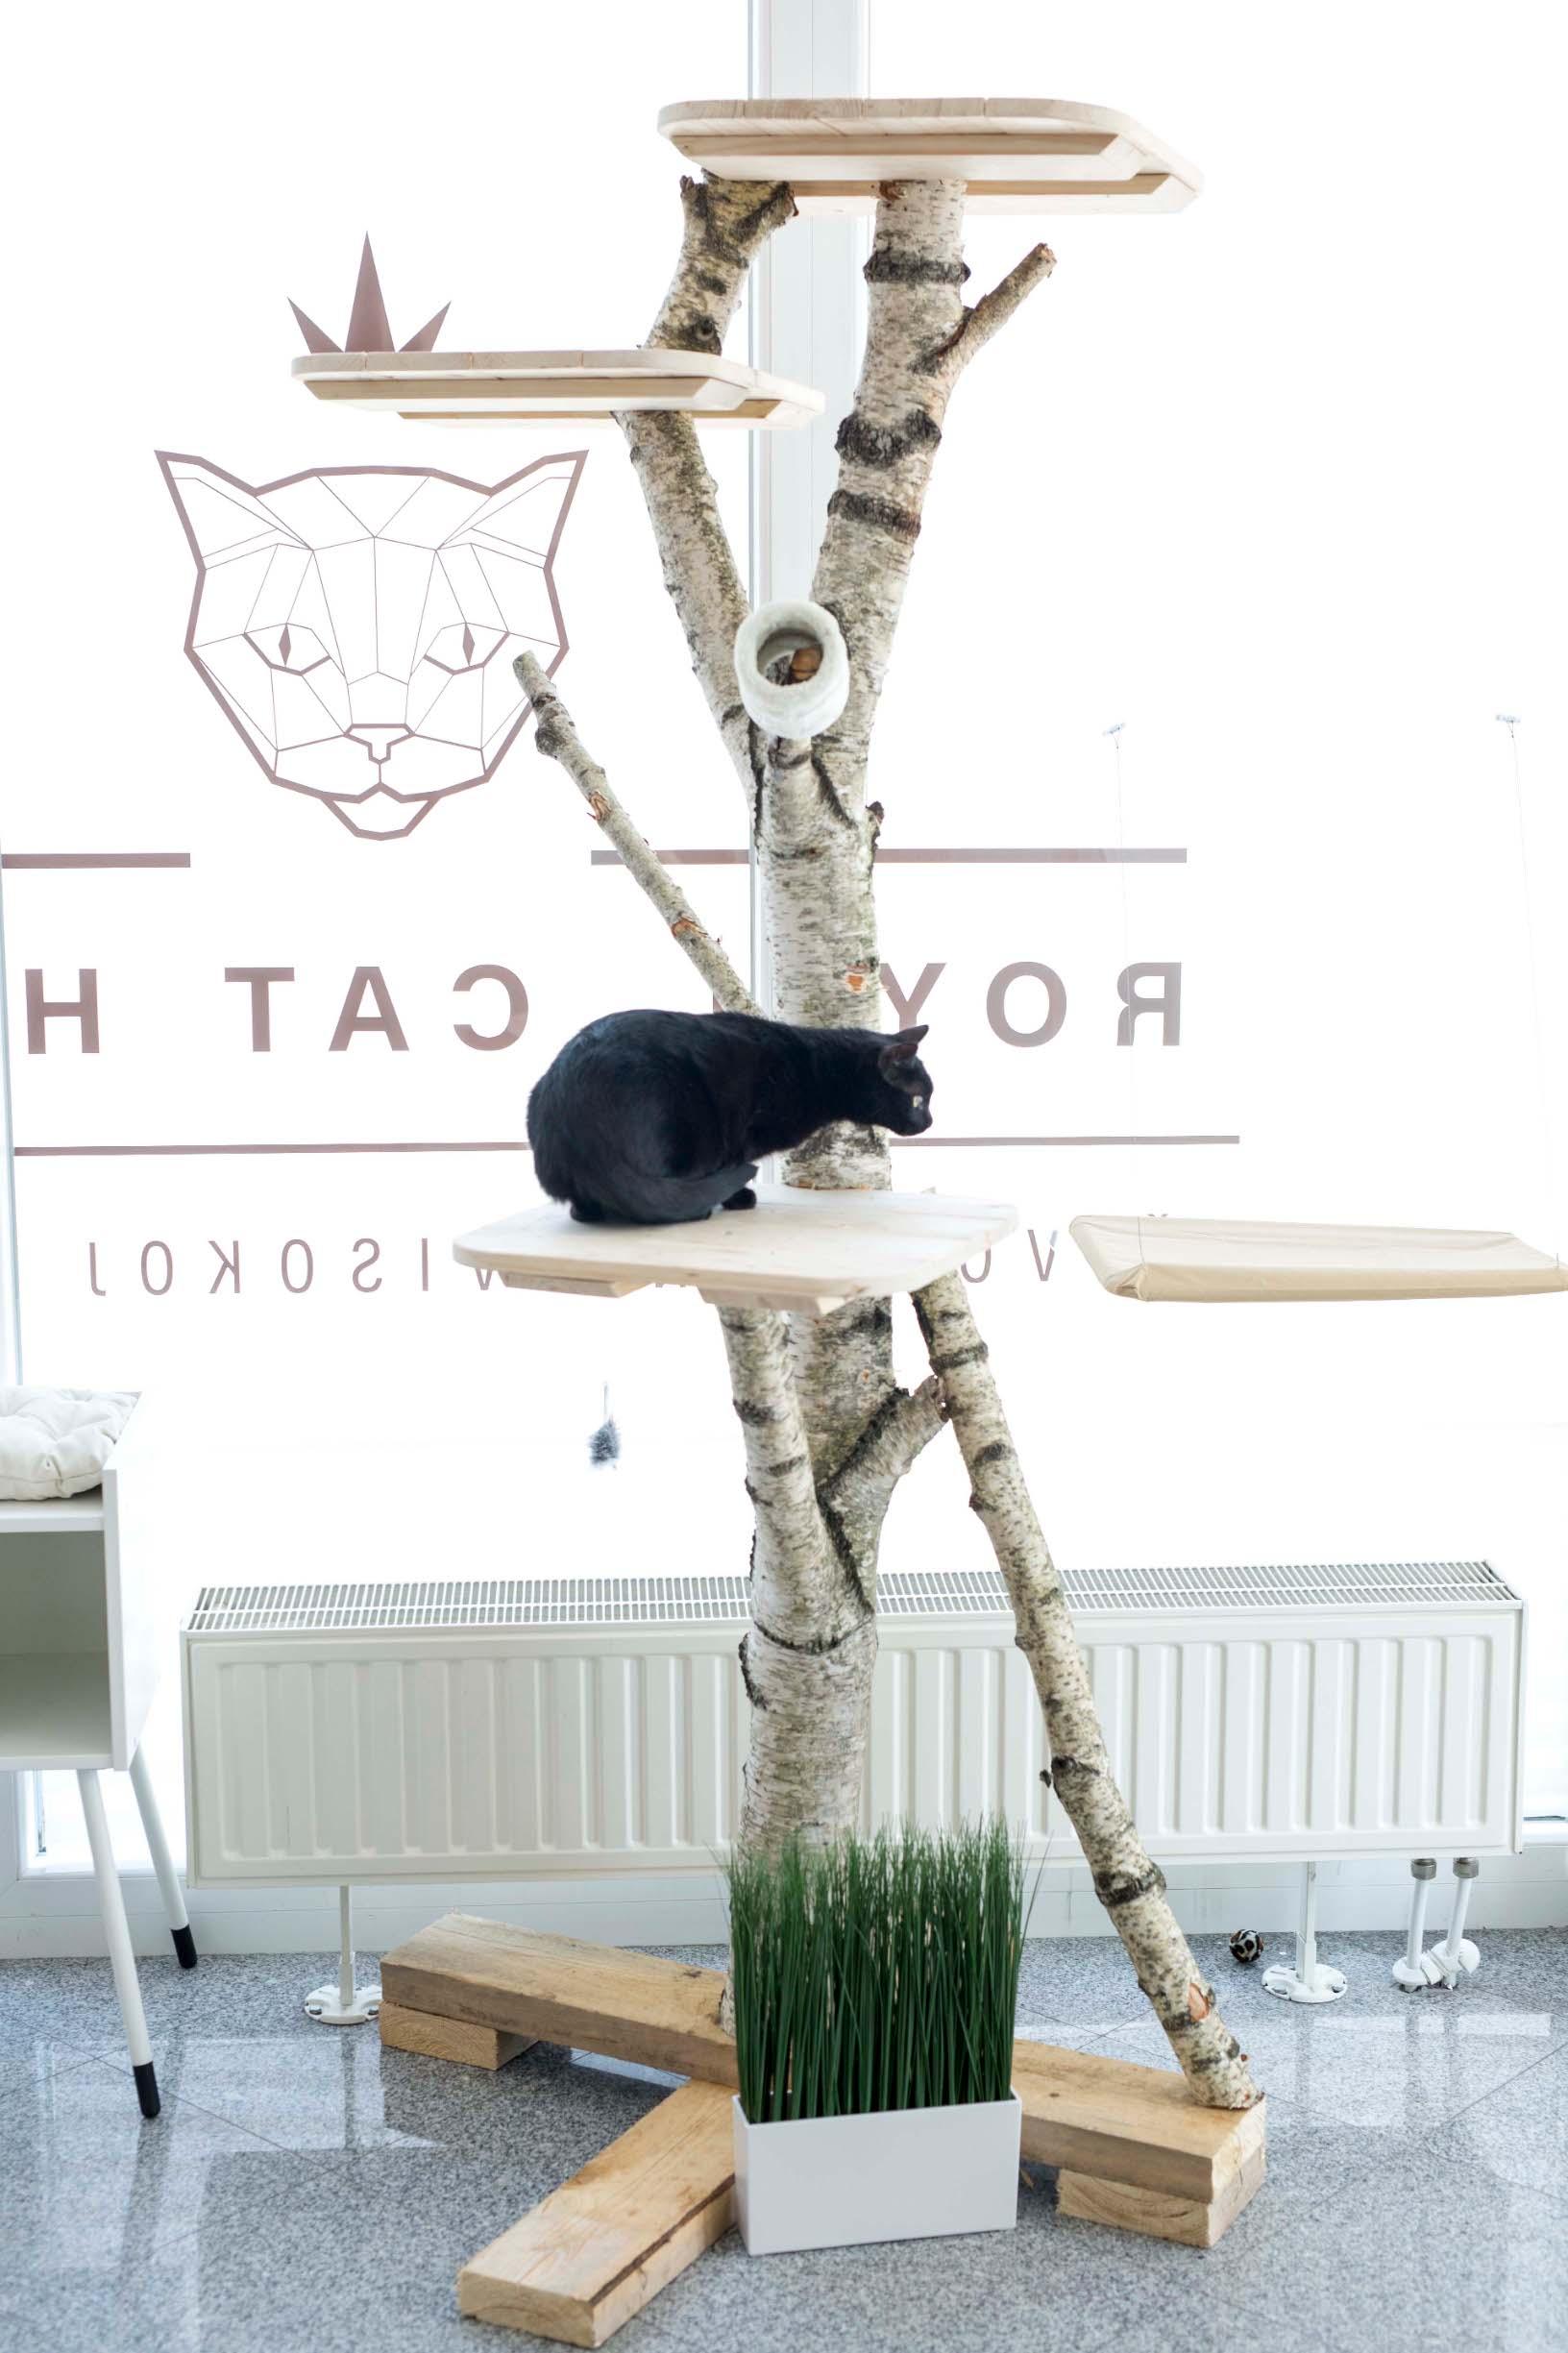 Hotel za macke  Ivana Kindl  Royal Cat Hotel  Dugo selo Fotograf Matej Dokic 130619